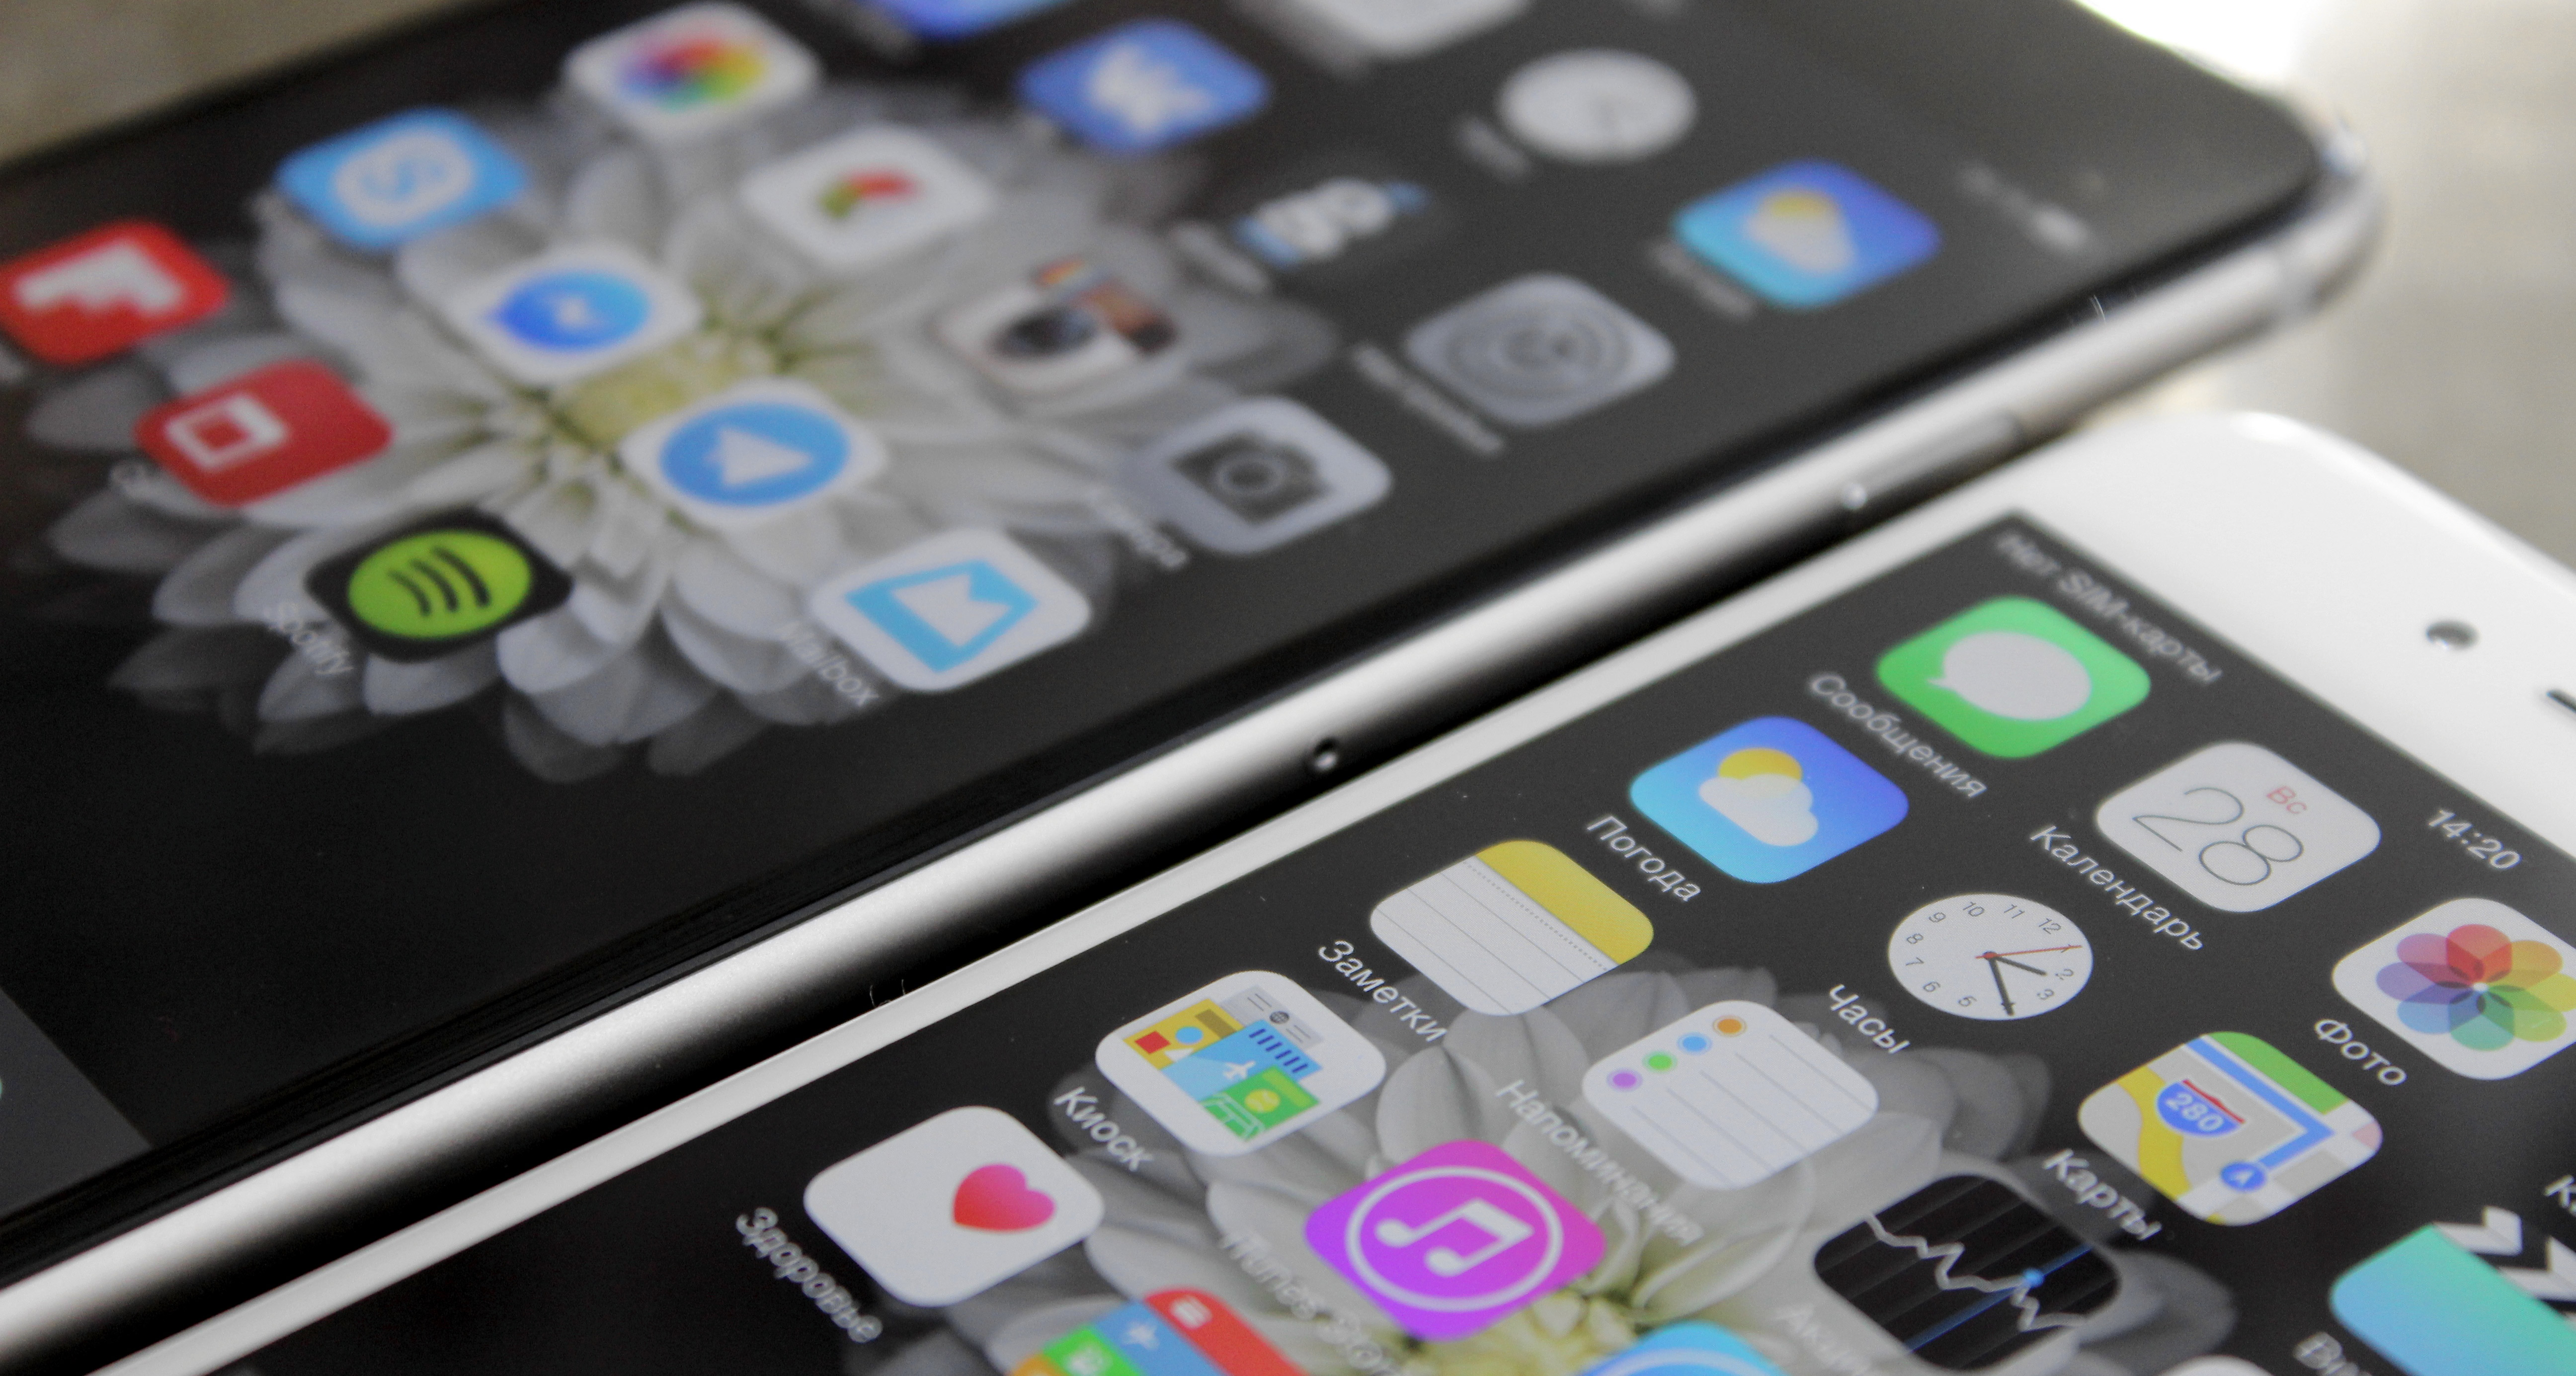 DisplayMate протестировала iPhone 6 Plus и iPhone 6 и осталась довольна